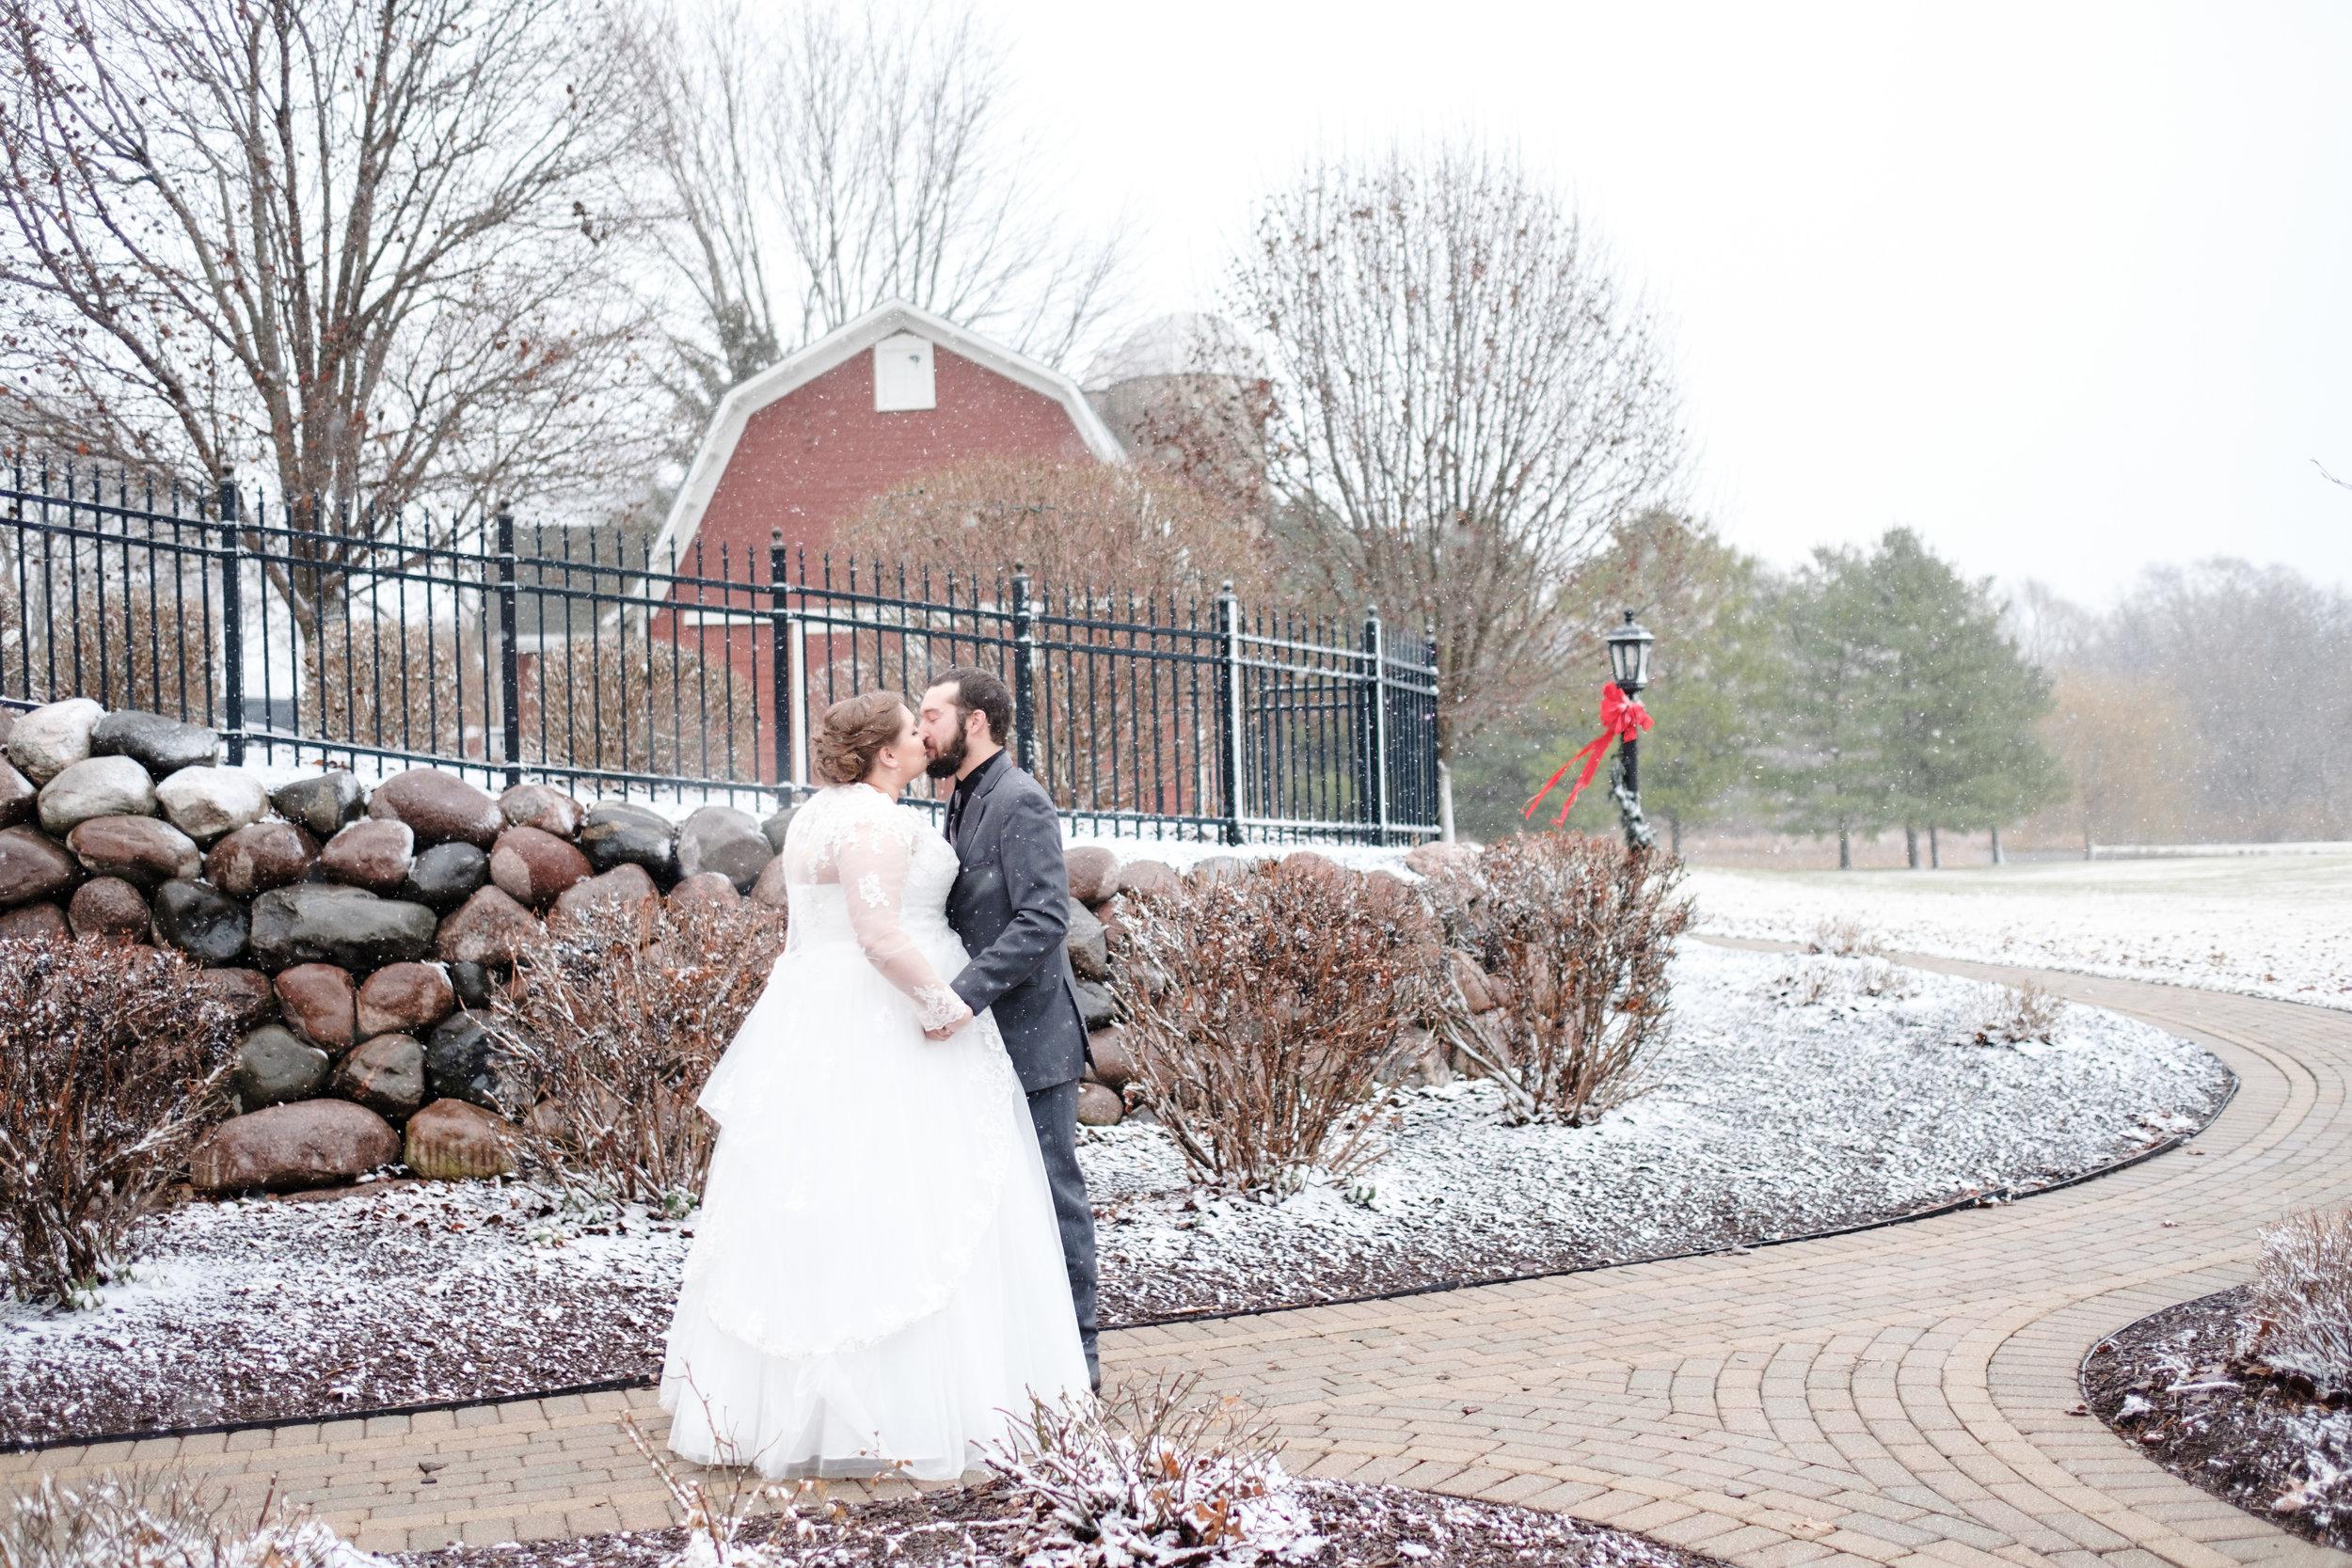 18-12-28 Corinne-Henry-Pavilion-Wedding-117.jpg